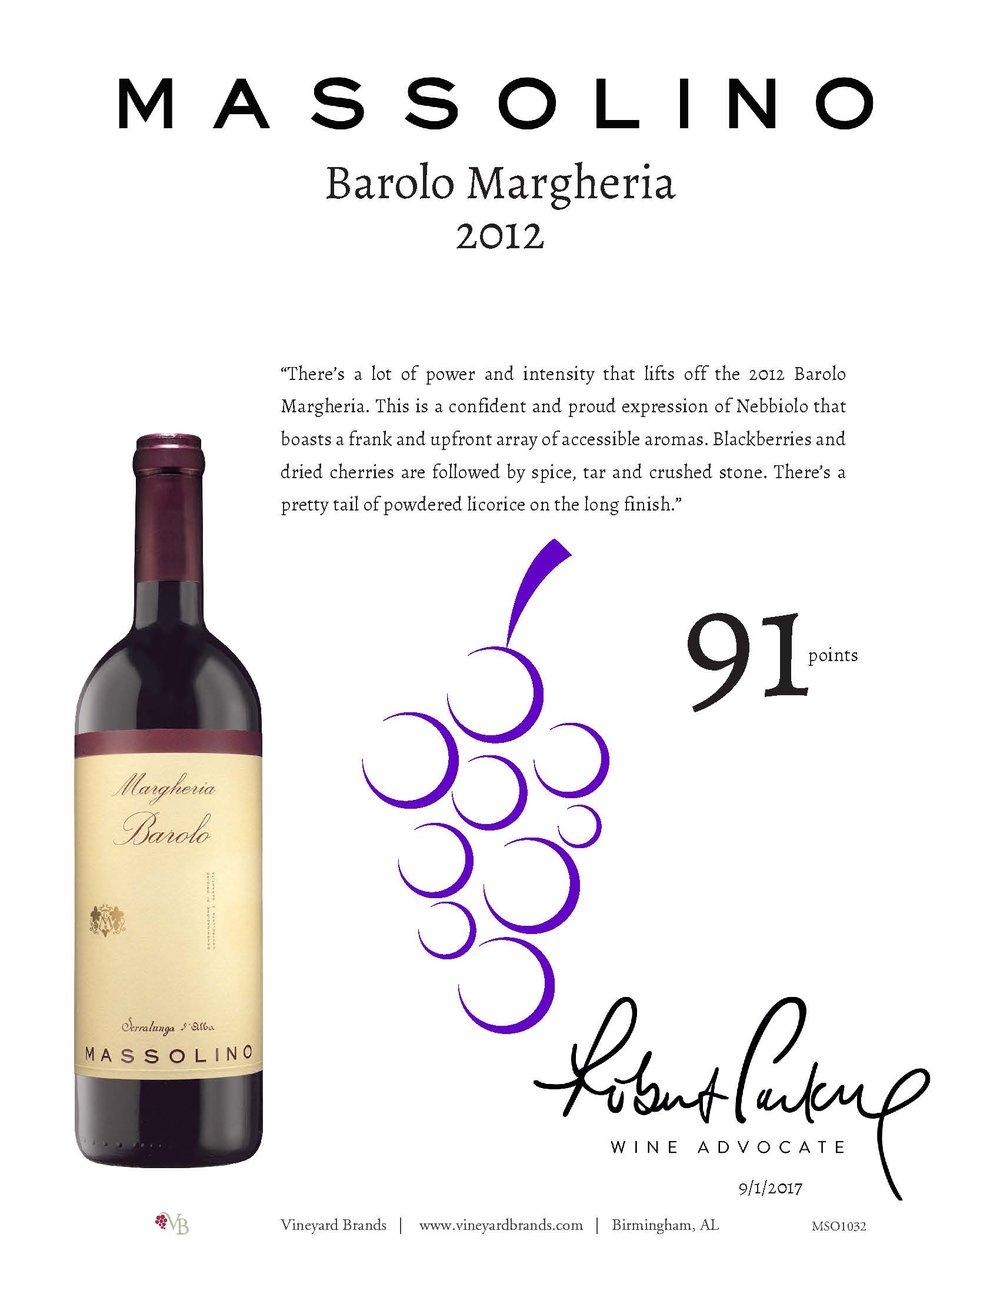 Massolino Barolo Margheria 2012.jpg